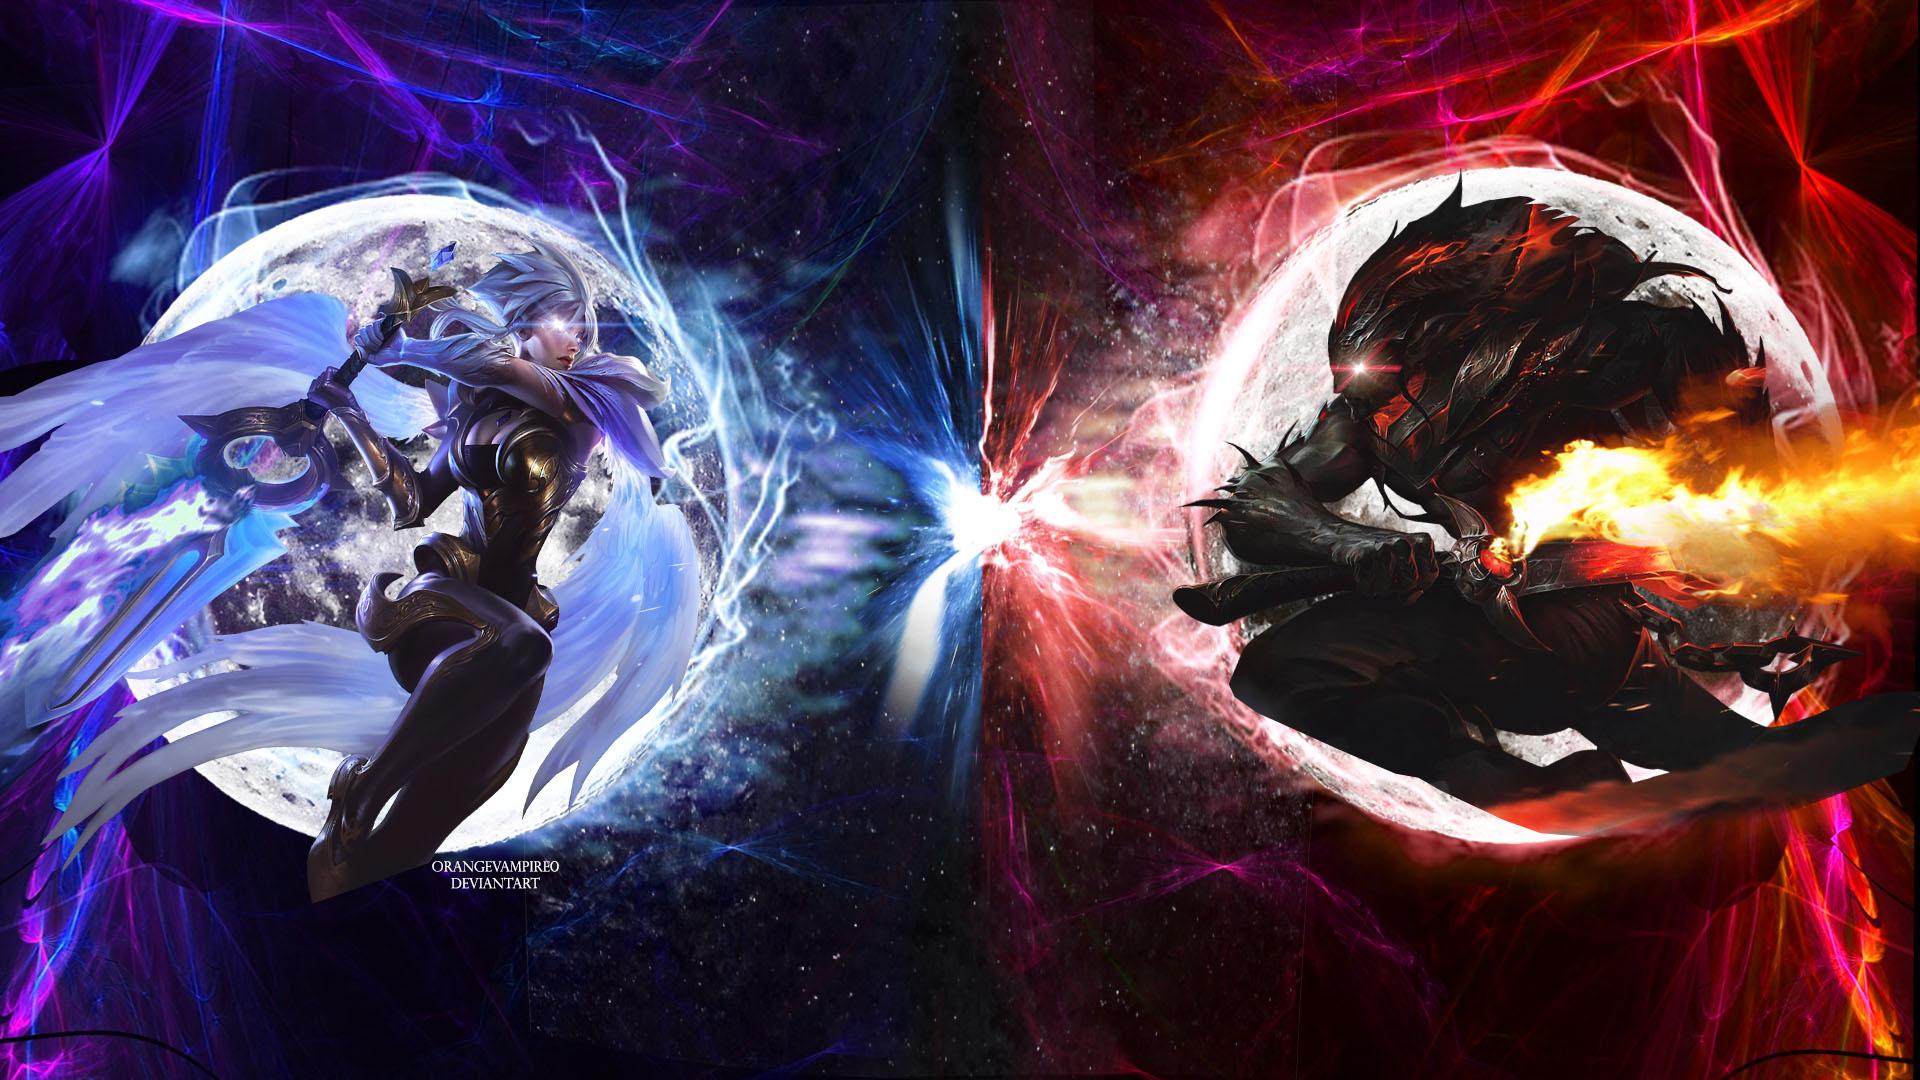 riven vs yasuo (light vs darkness) wallpaperorangevampire0 on